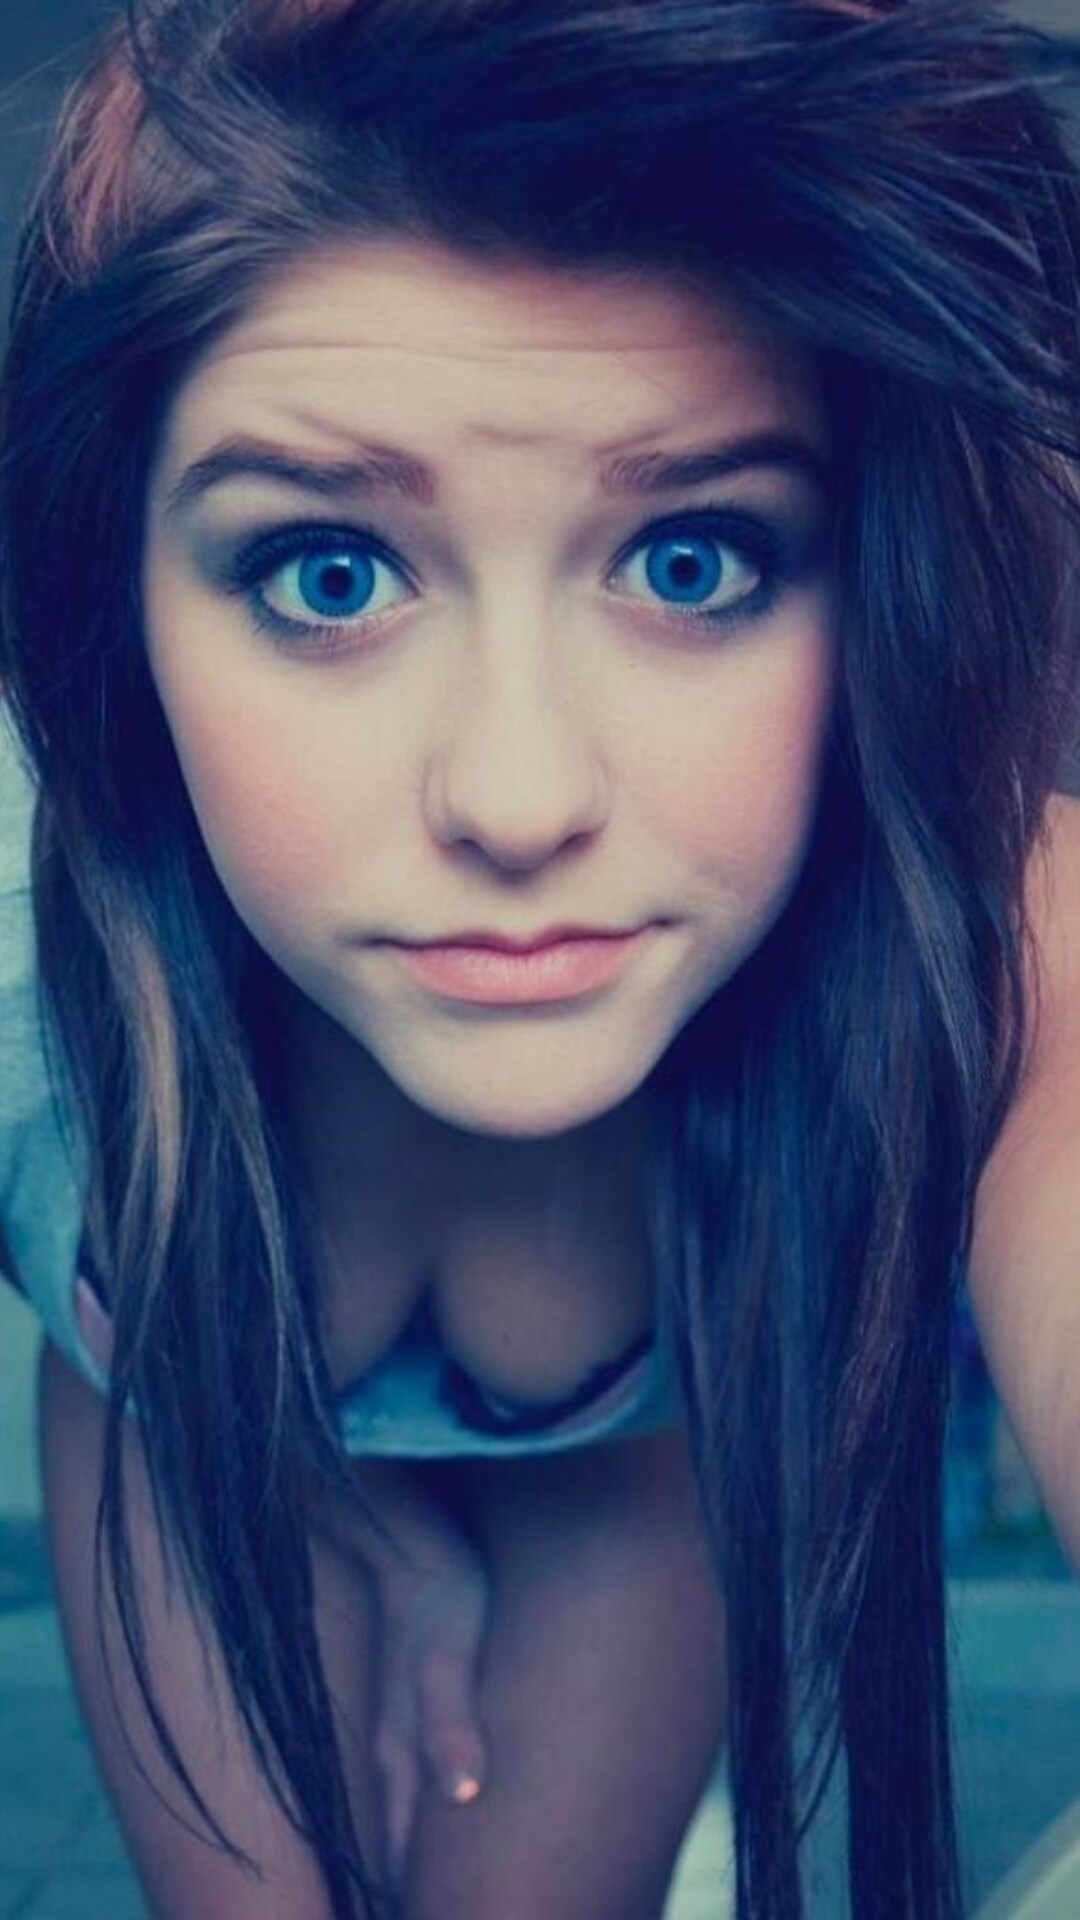 1080x1920 blue eyes cute teen girl iphone 7 6s 6 plus  pixel xl  one plus 3 3t 5 hd 4k